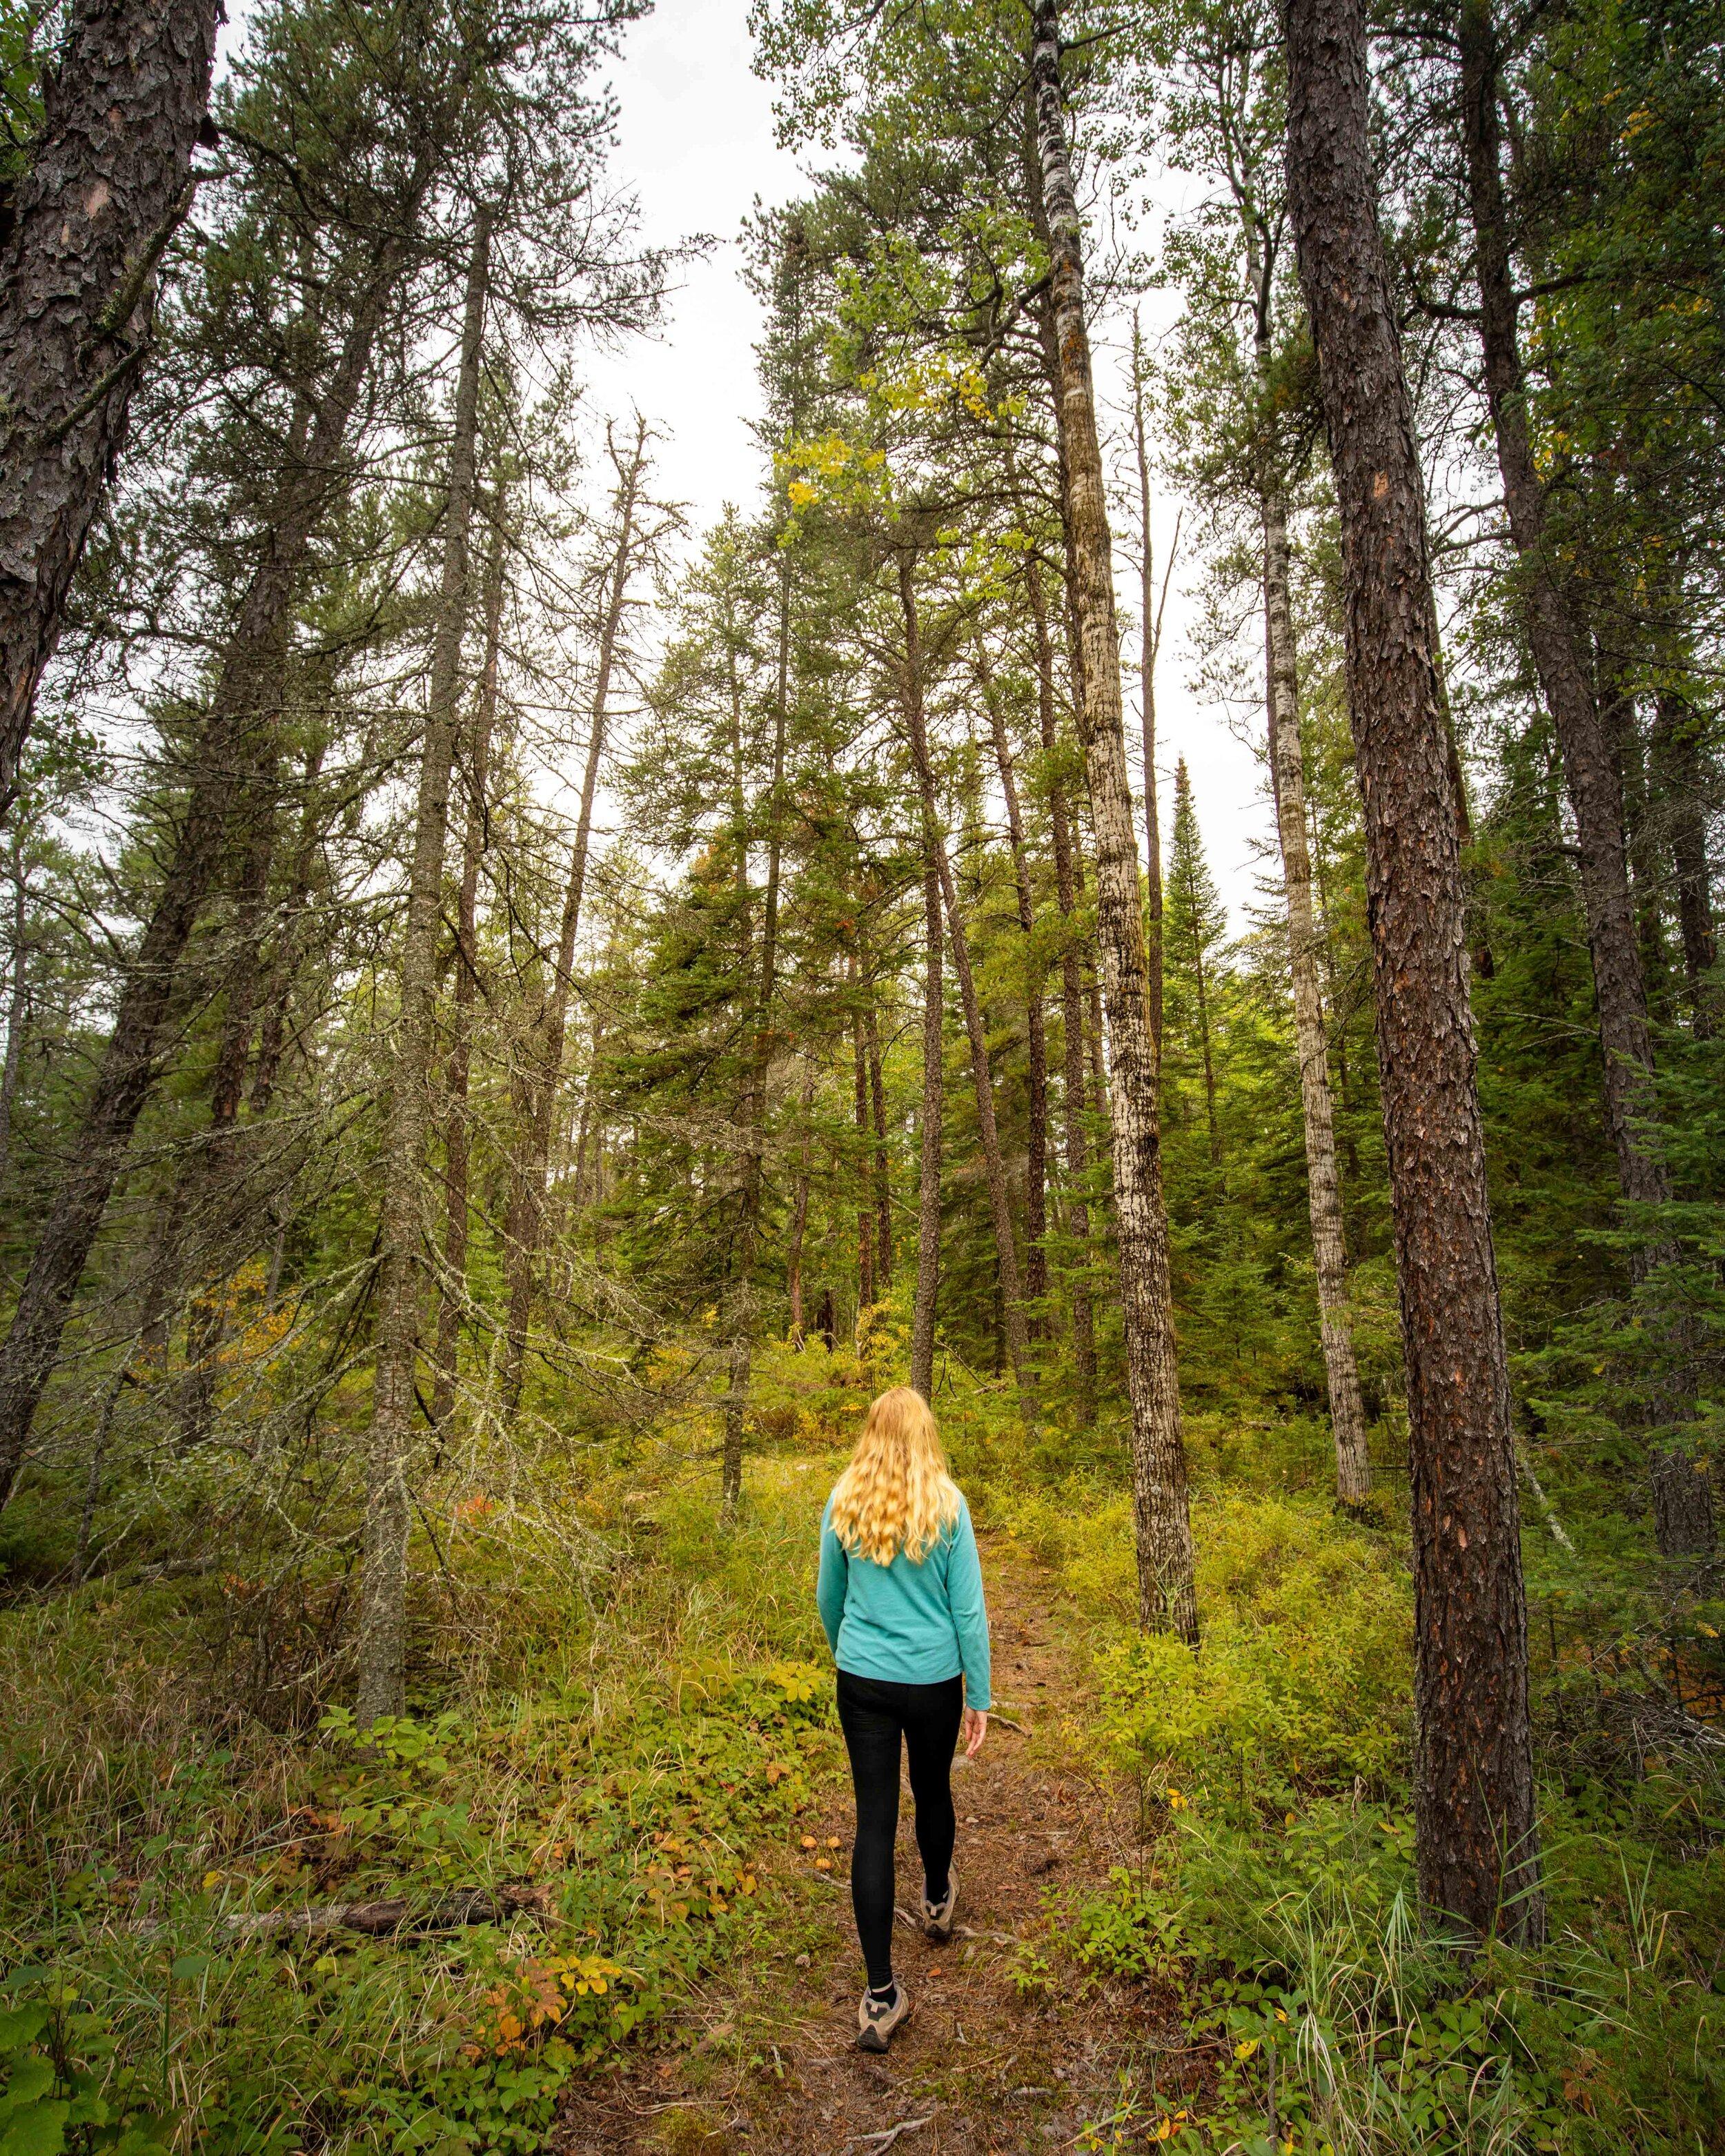 The Pine Ridge Trail at Falcon Trails Resort